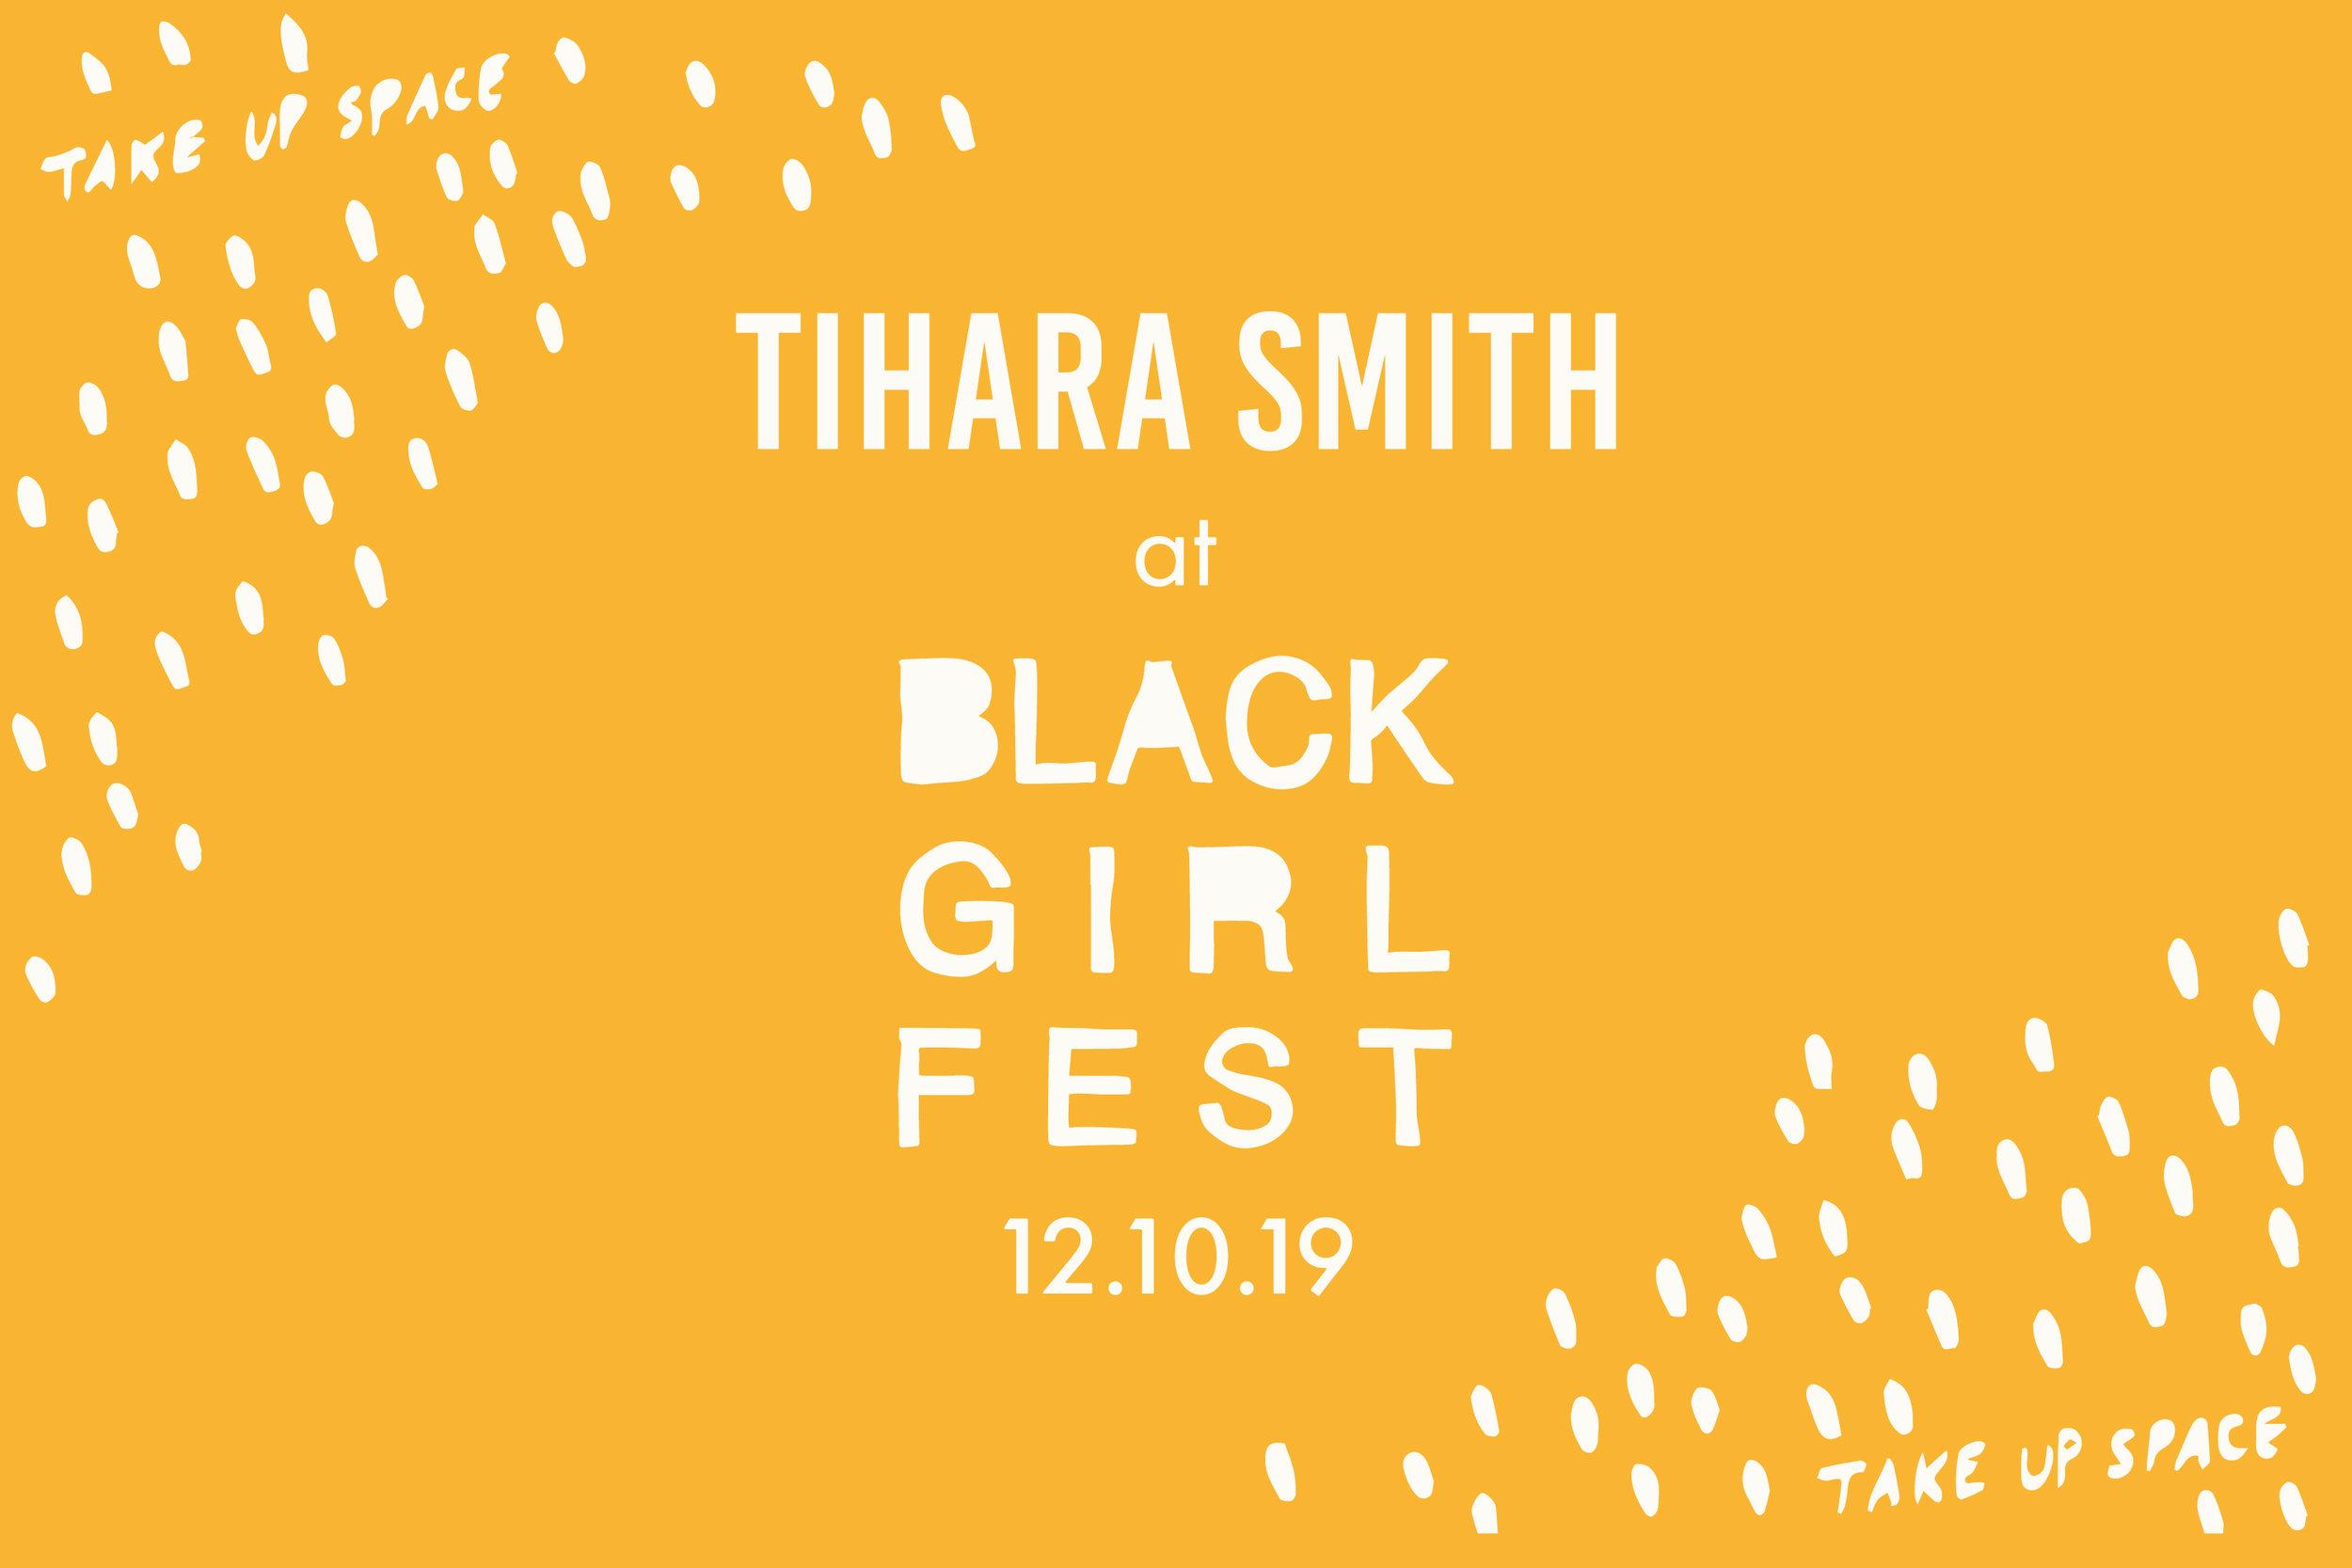 blackgirlfest_tiharasmith.jpg